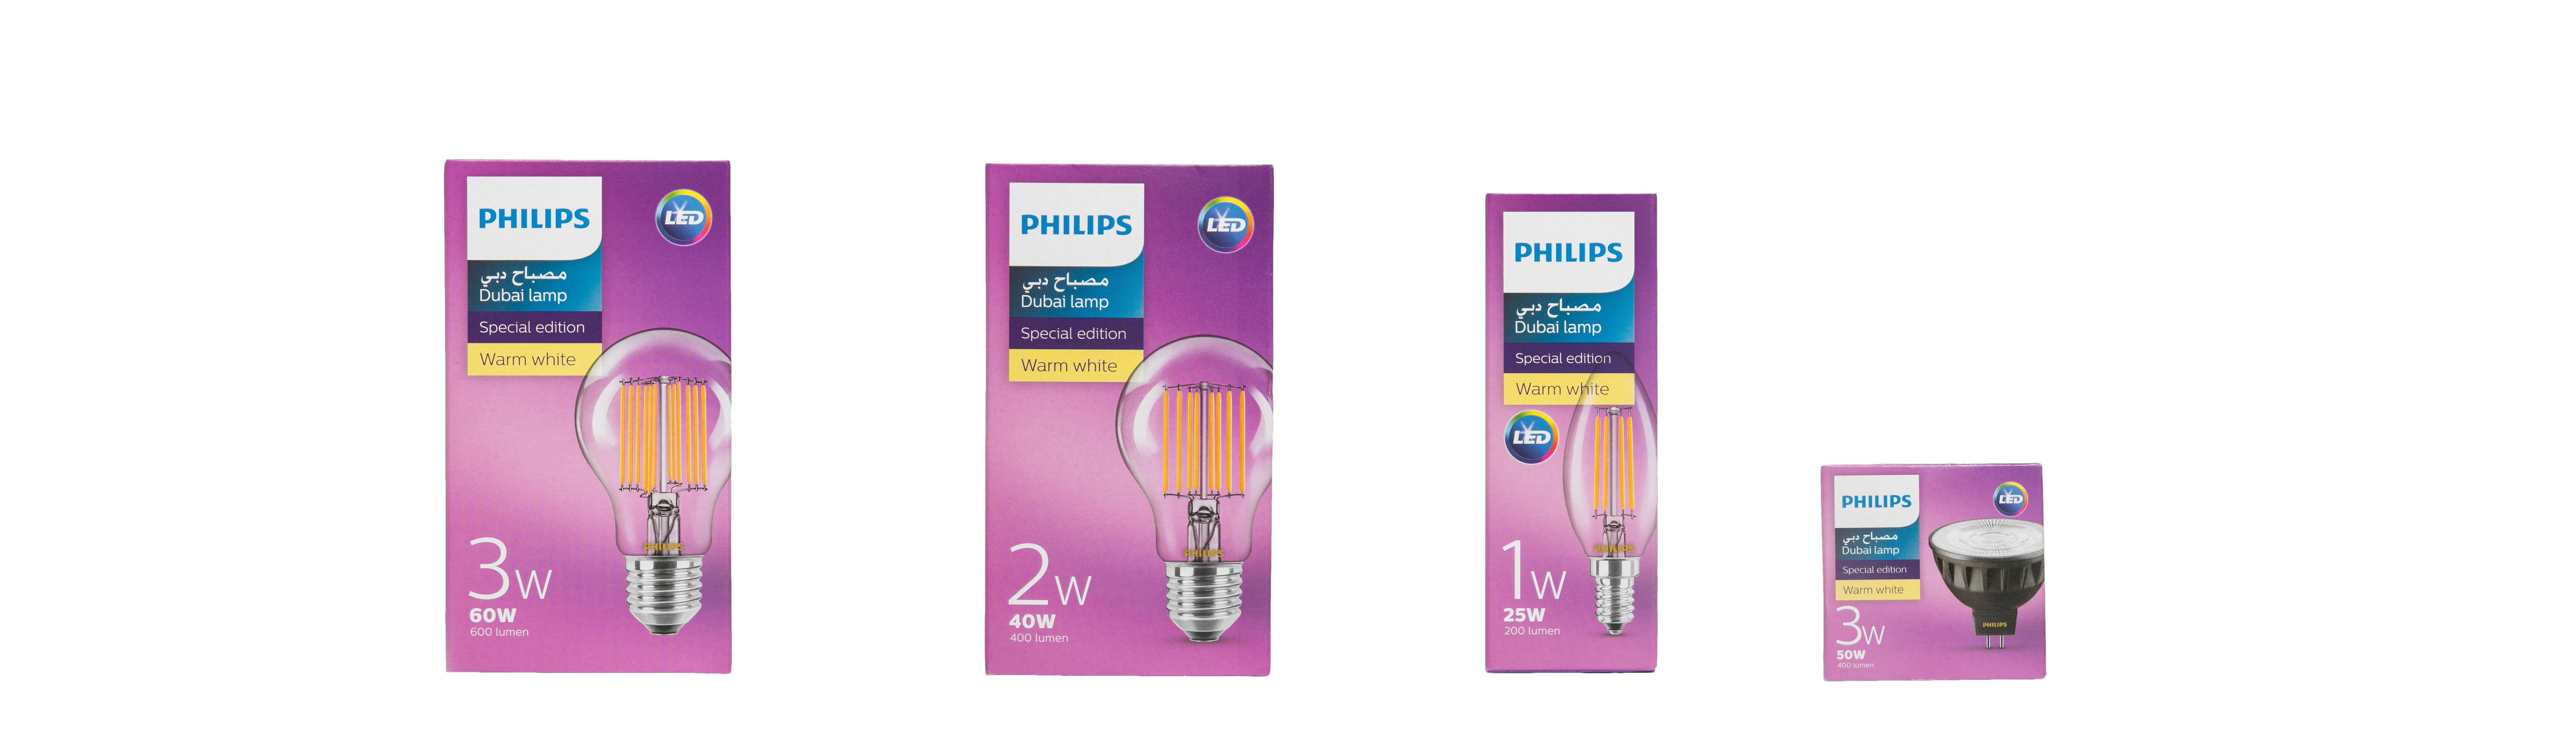 rgb and ambiance light ledrise wifi tunable hue lighting philips bulb white rgbw color led